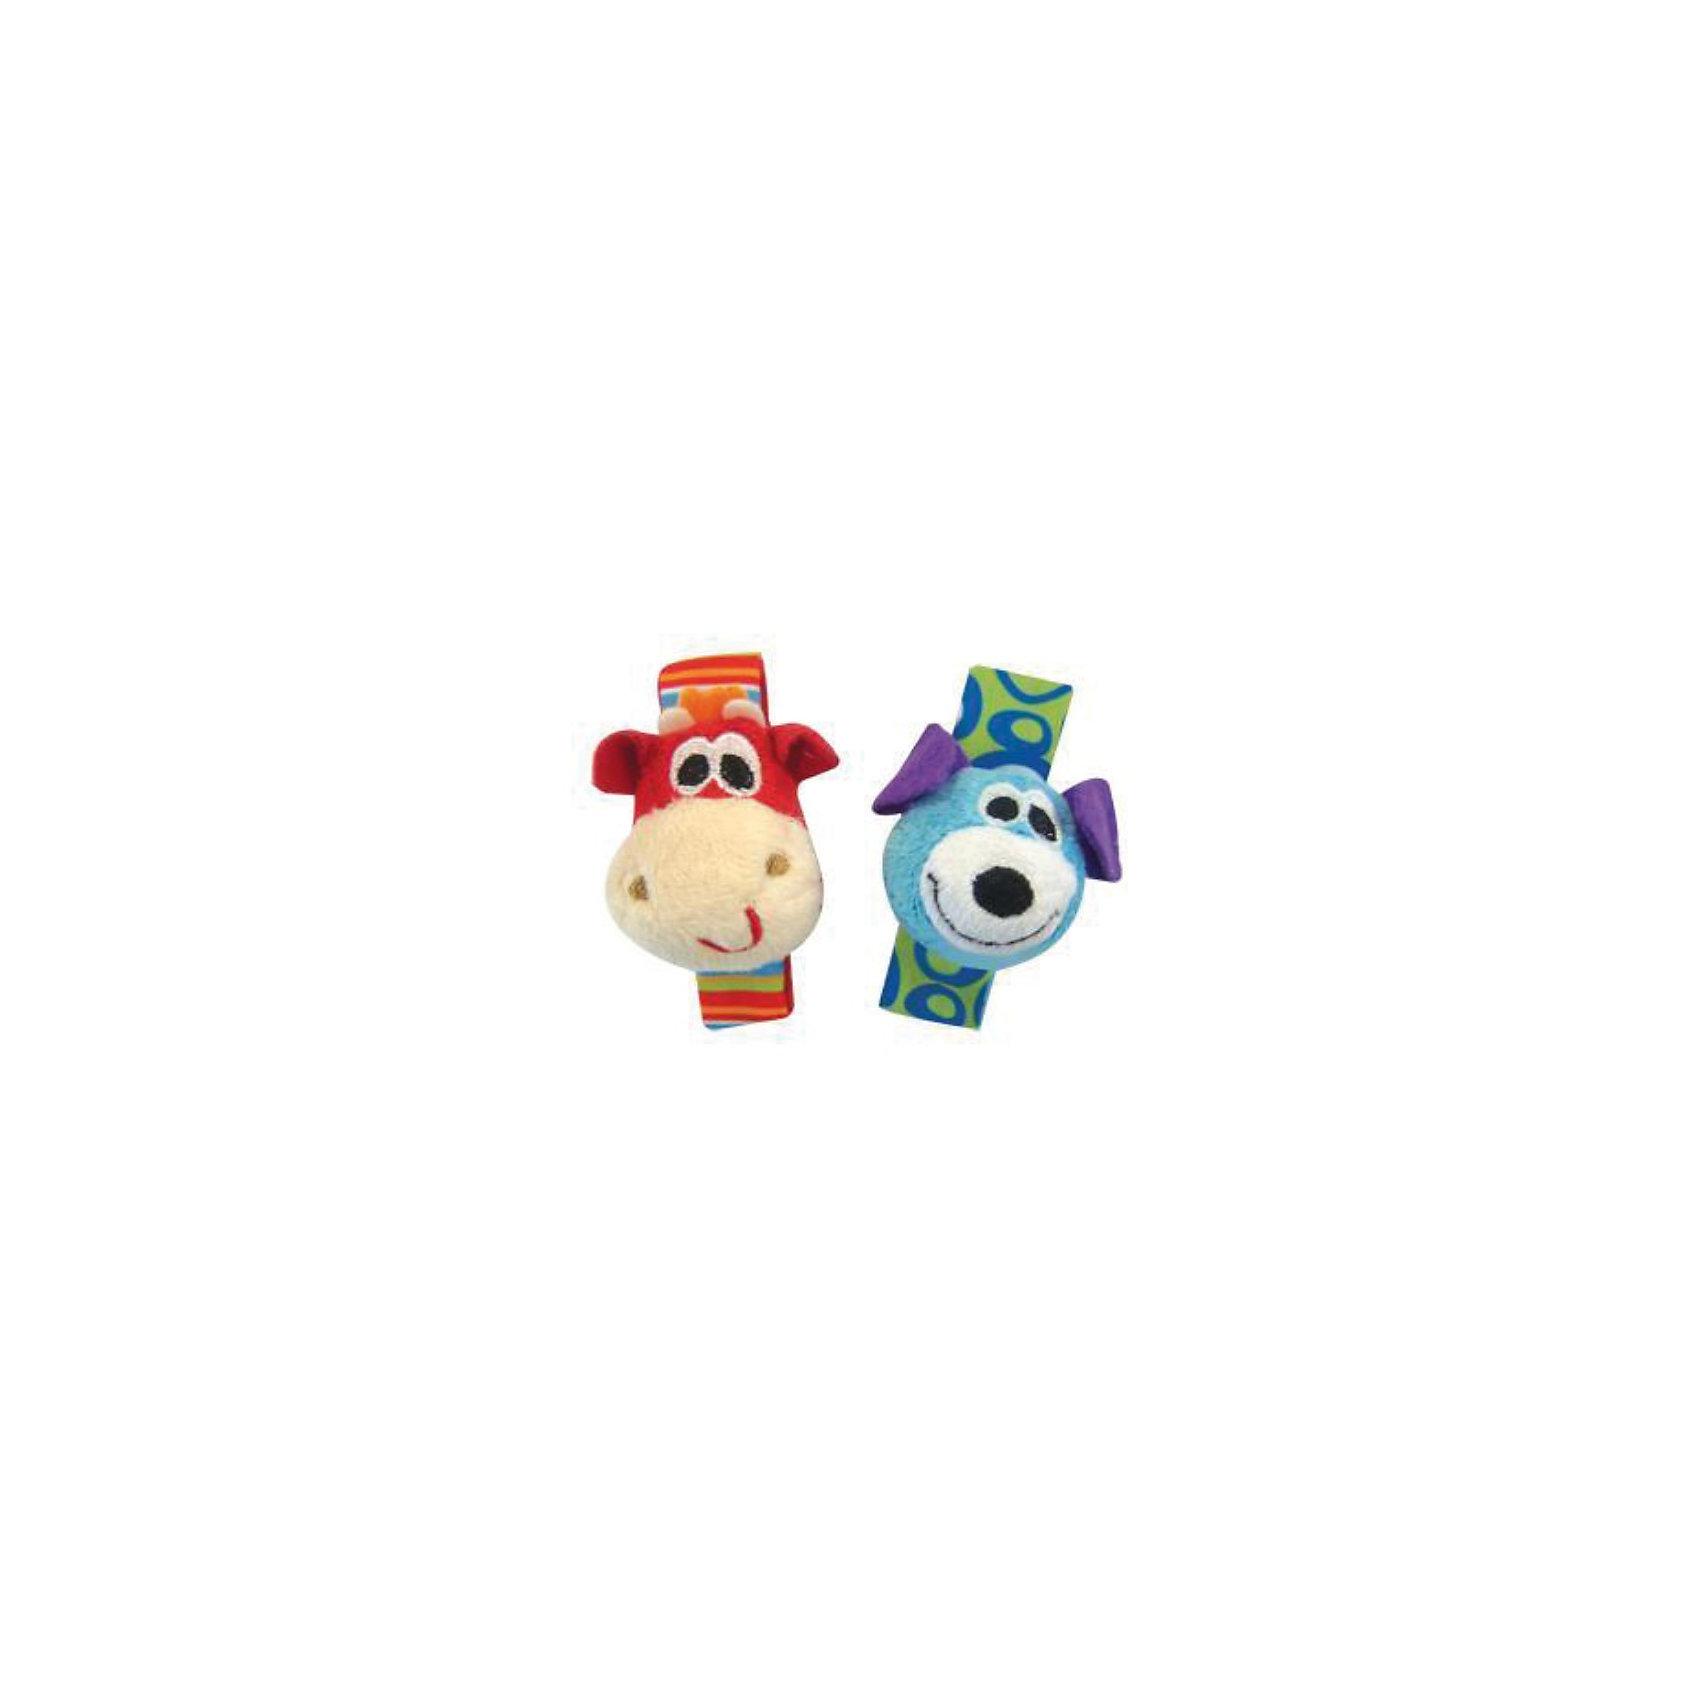 Playgro Мягкая игрушка-погремушка на ручку, Playgro, 2 шт. therme гель для душа иланг иланг 200 мл